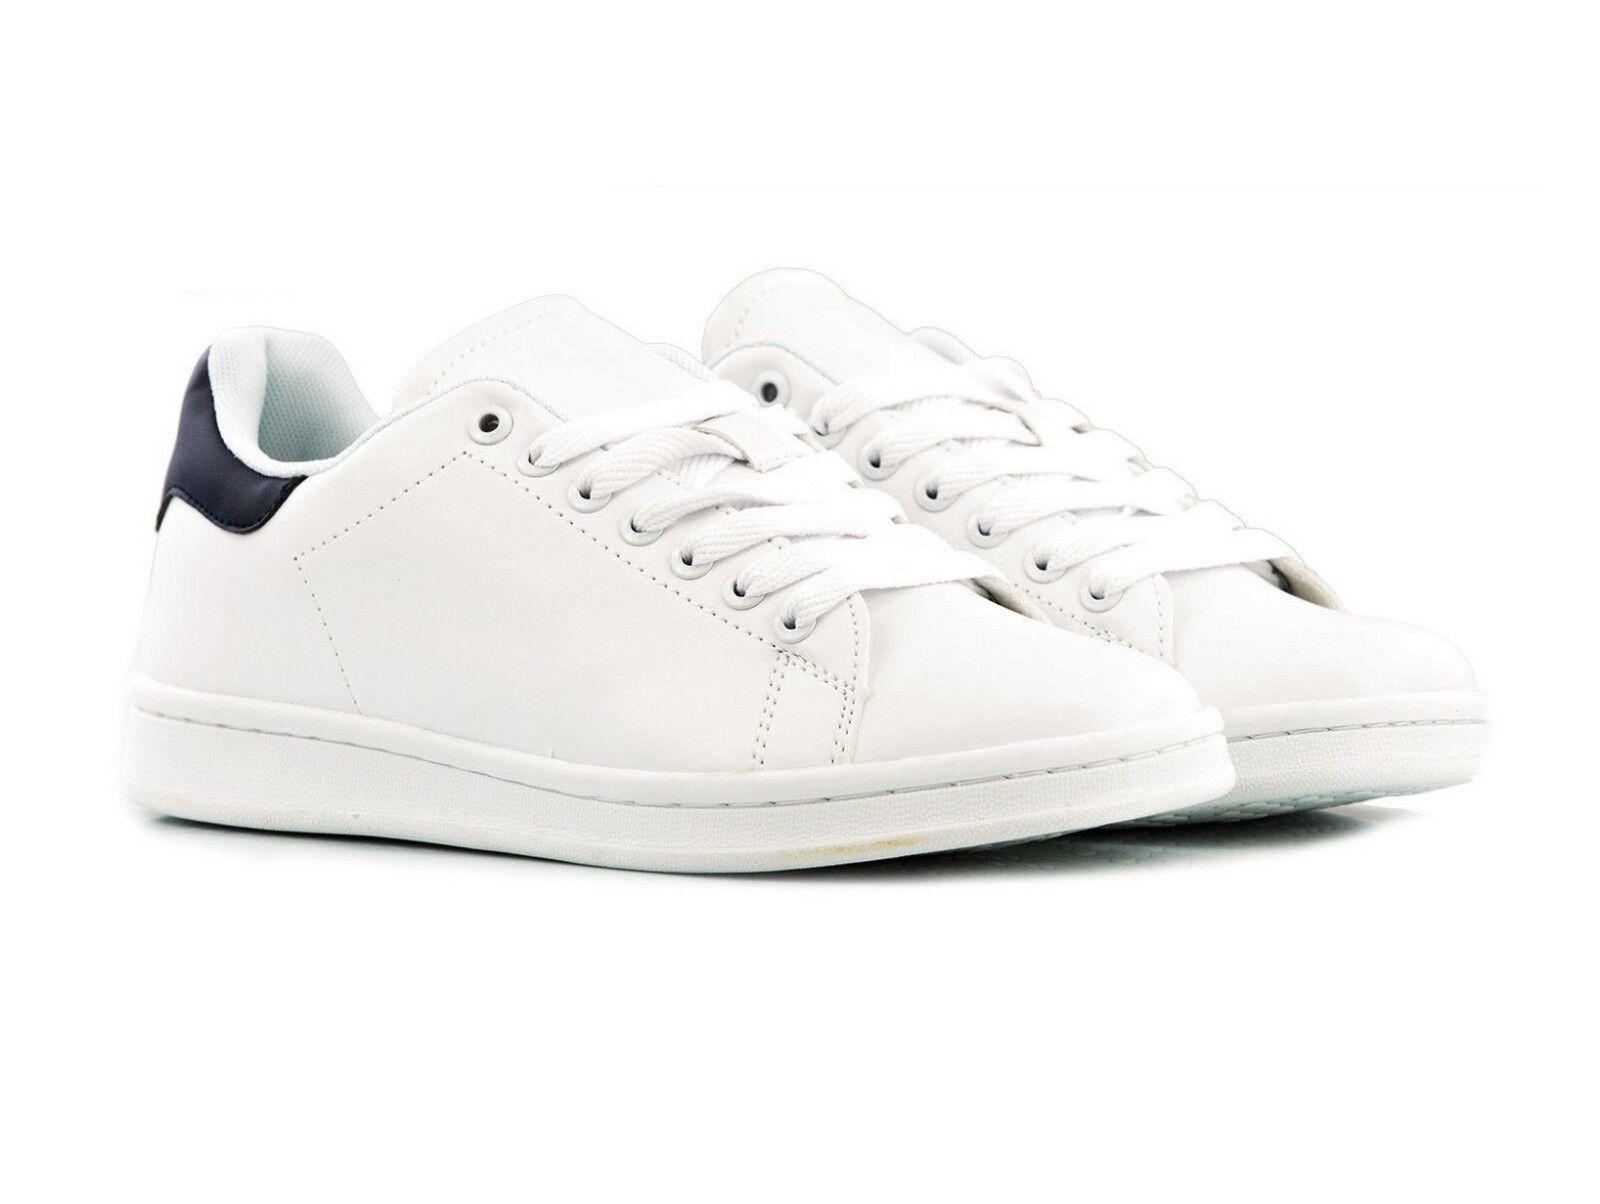 Adidas Stan Smith PK Pelle Scarpe ginnastica 7718 | Acquisti